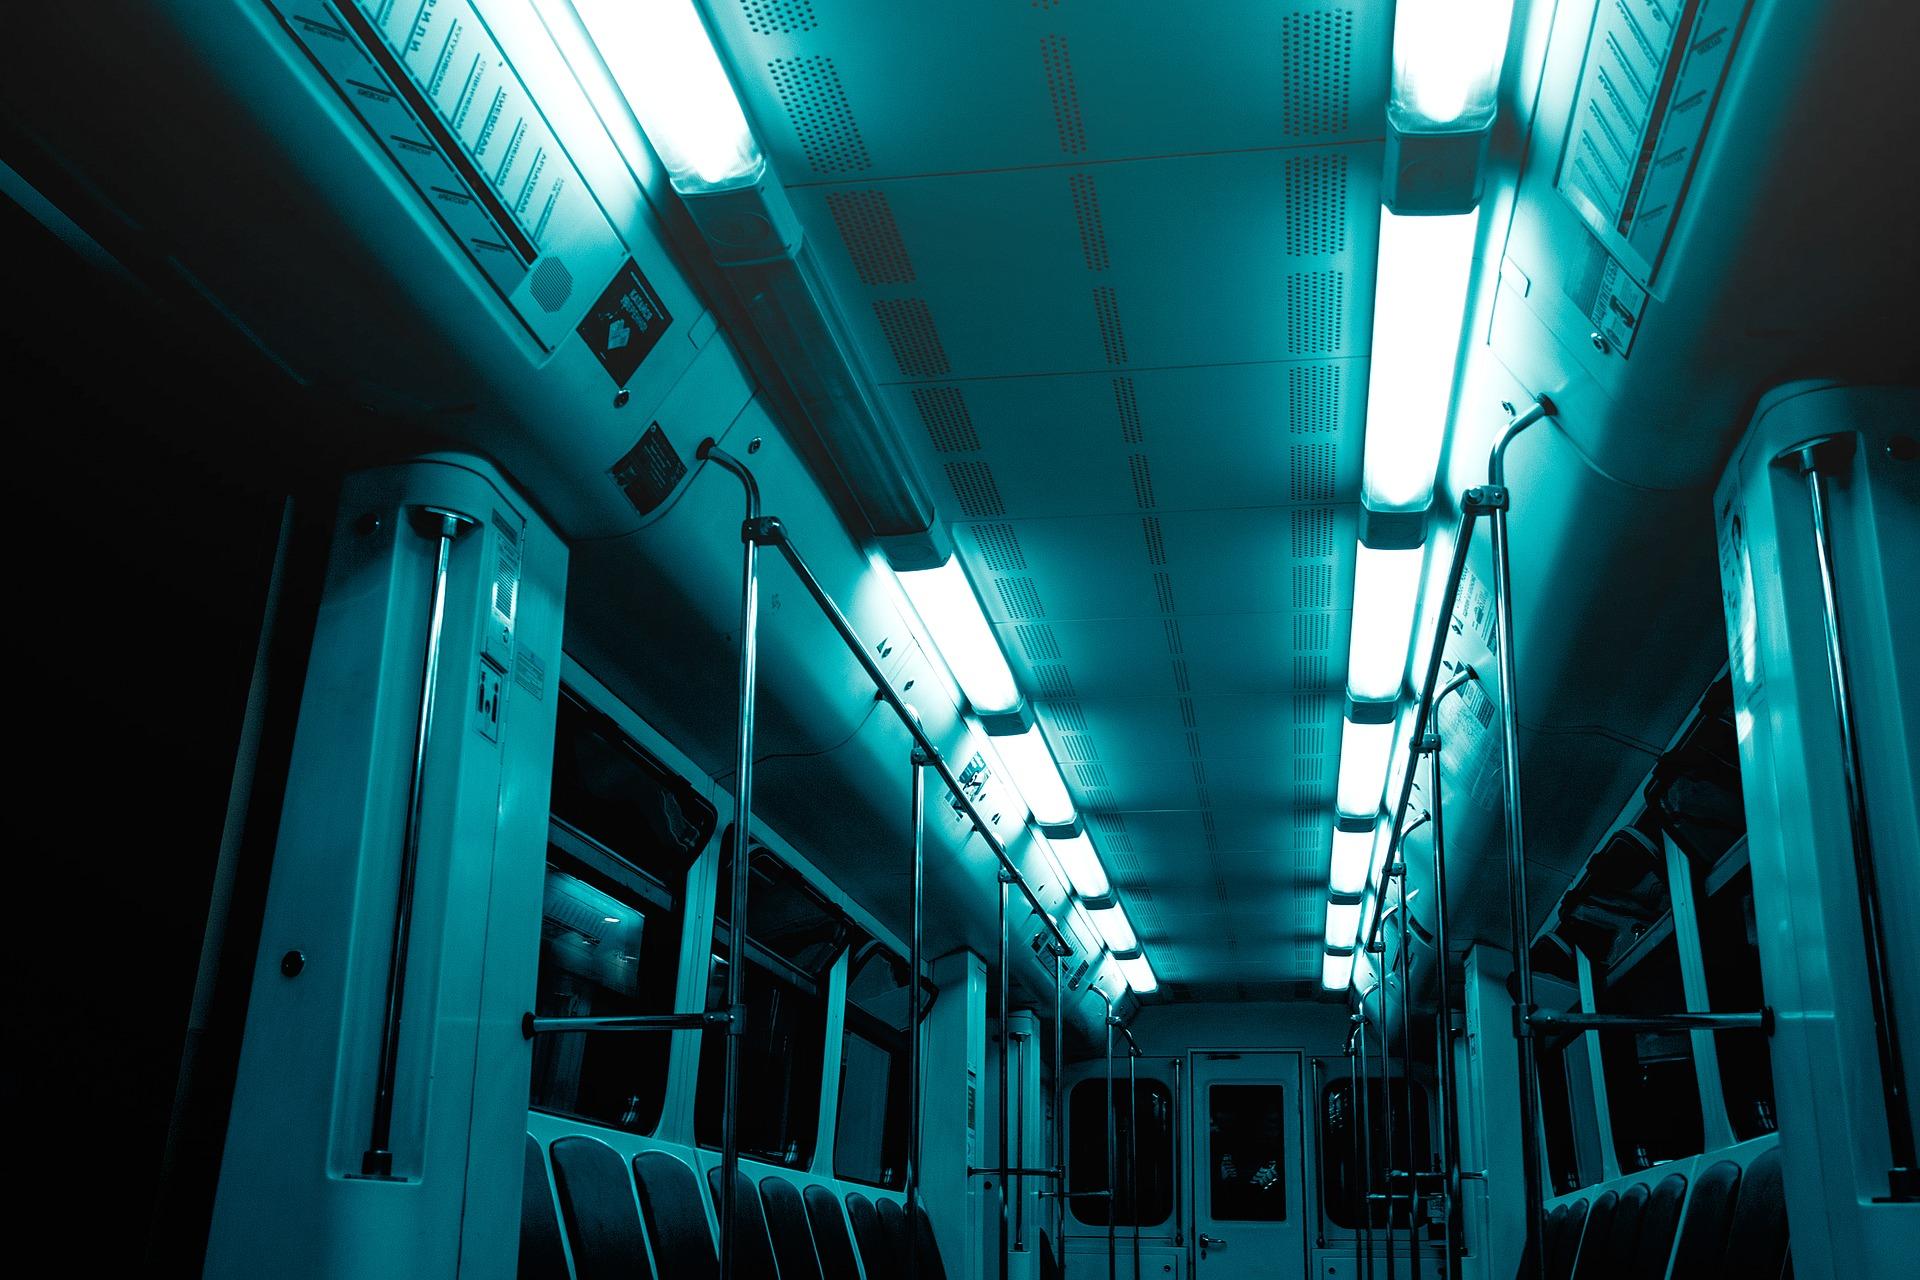 moskva, metro, stanice